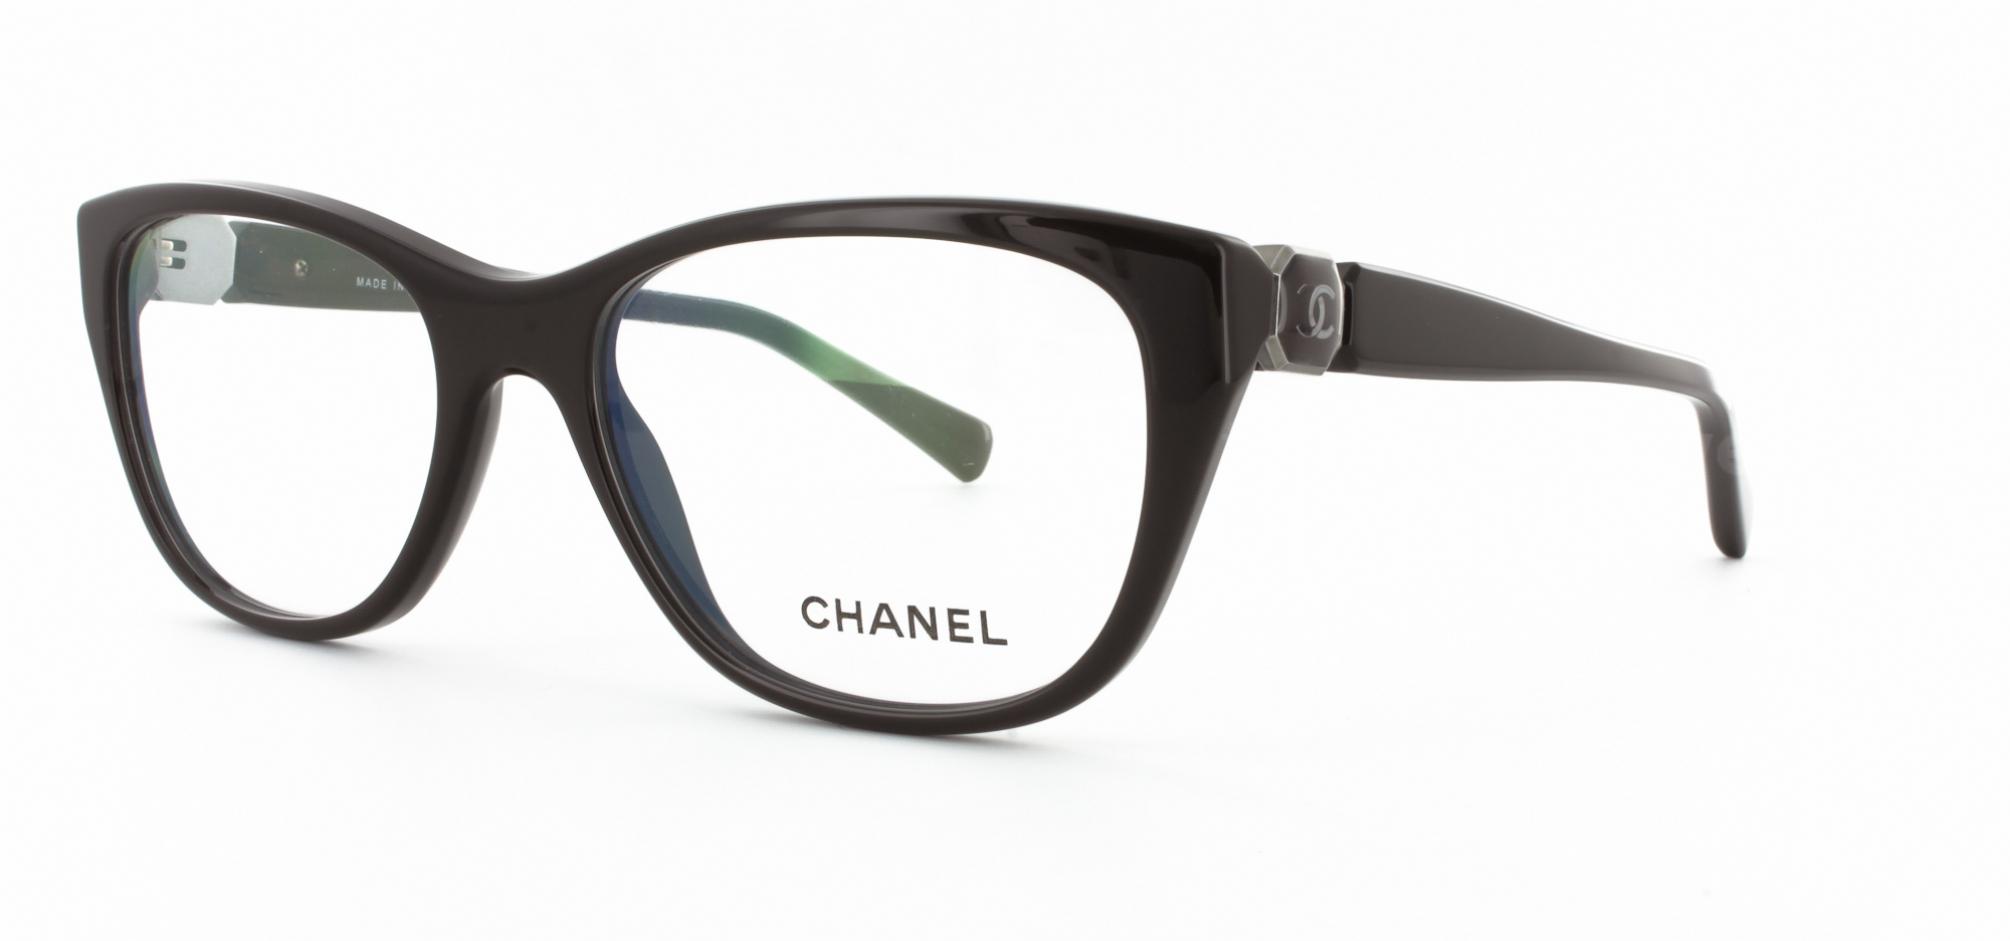 220e8b4c5e1 Buy Chanel Eyeglasses directly from OpticsFast.com